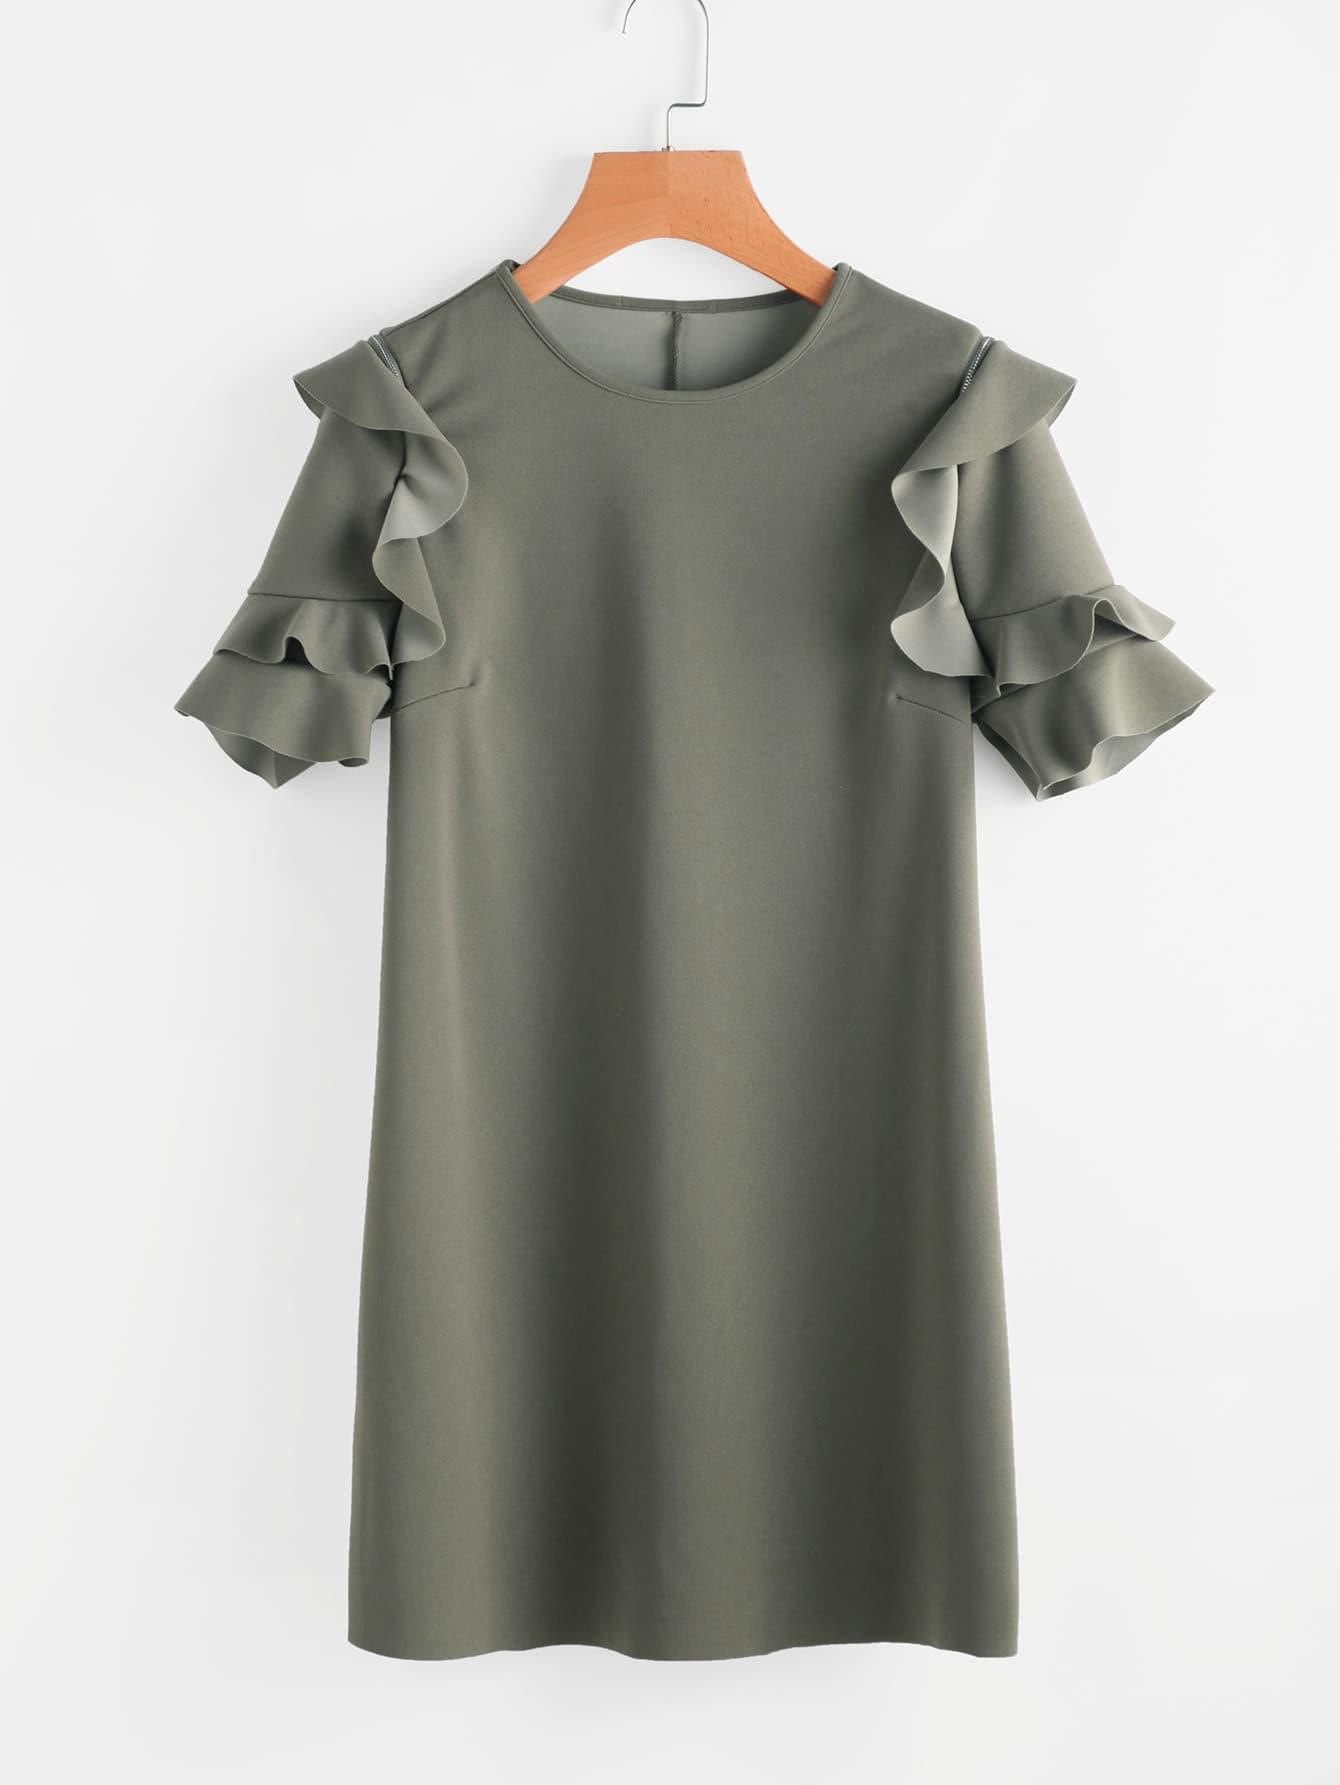 Frill Detail Sleeve Tunic Dress dress170706455